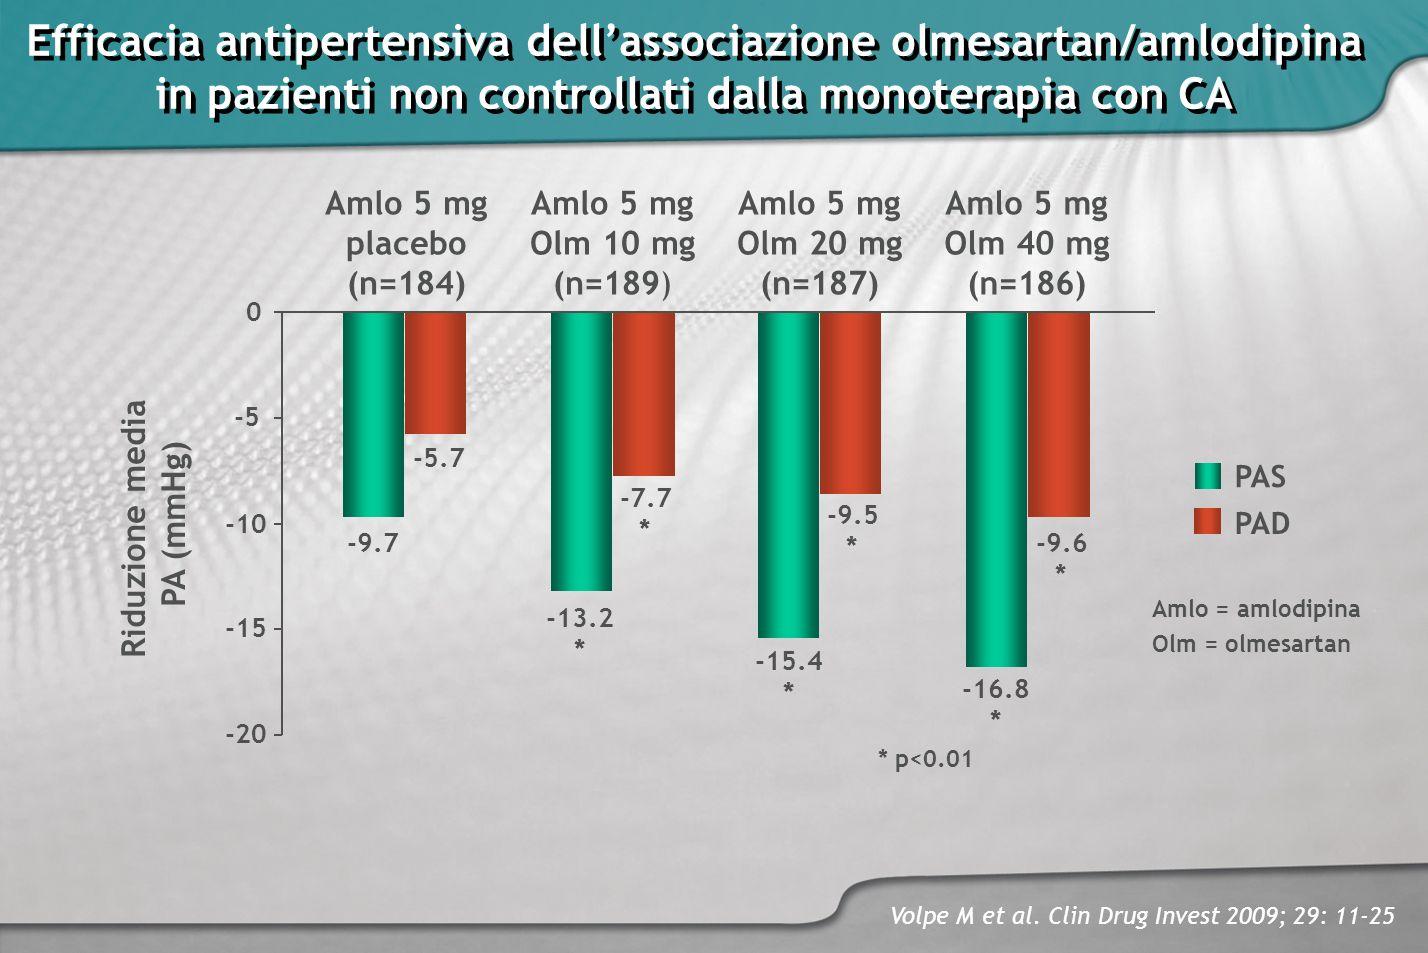 Efficacia antipertensiva dell'associazione olmesartan/amlodipina